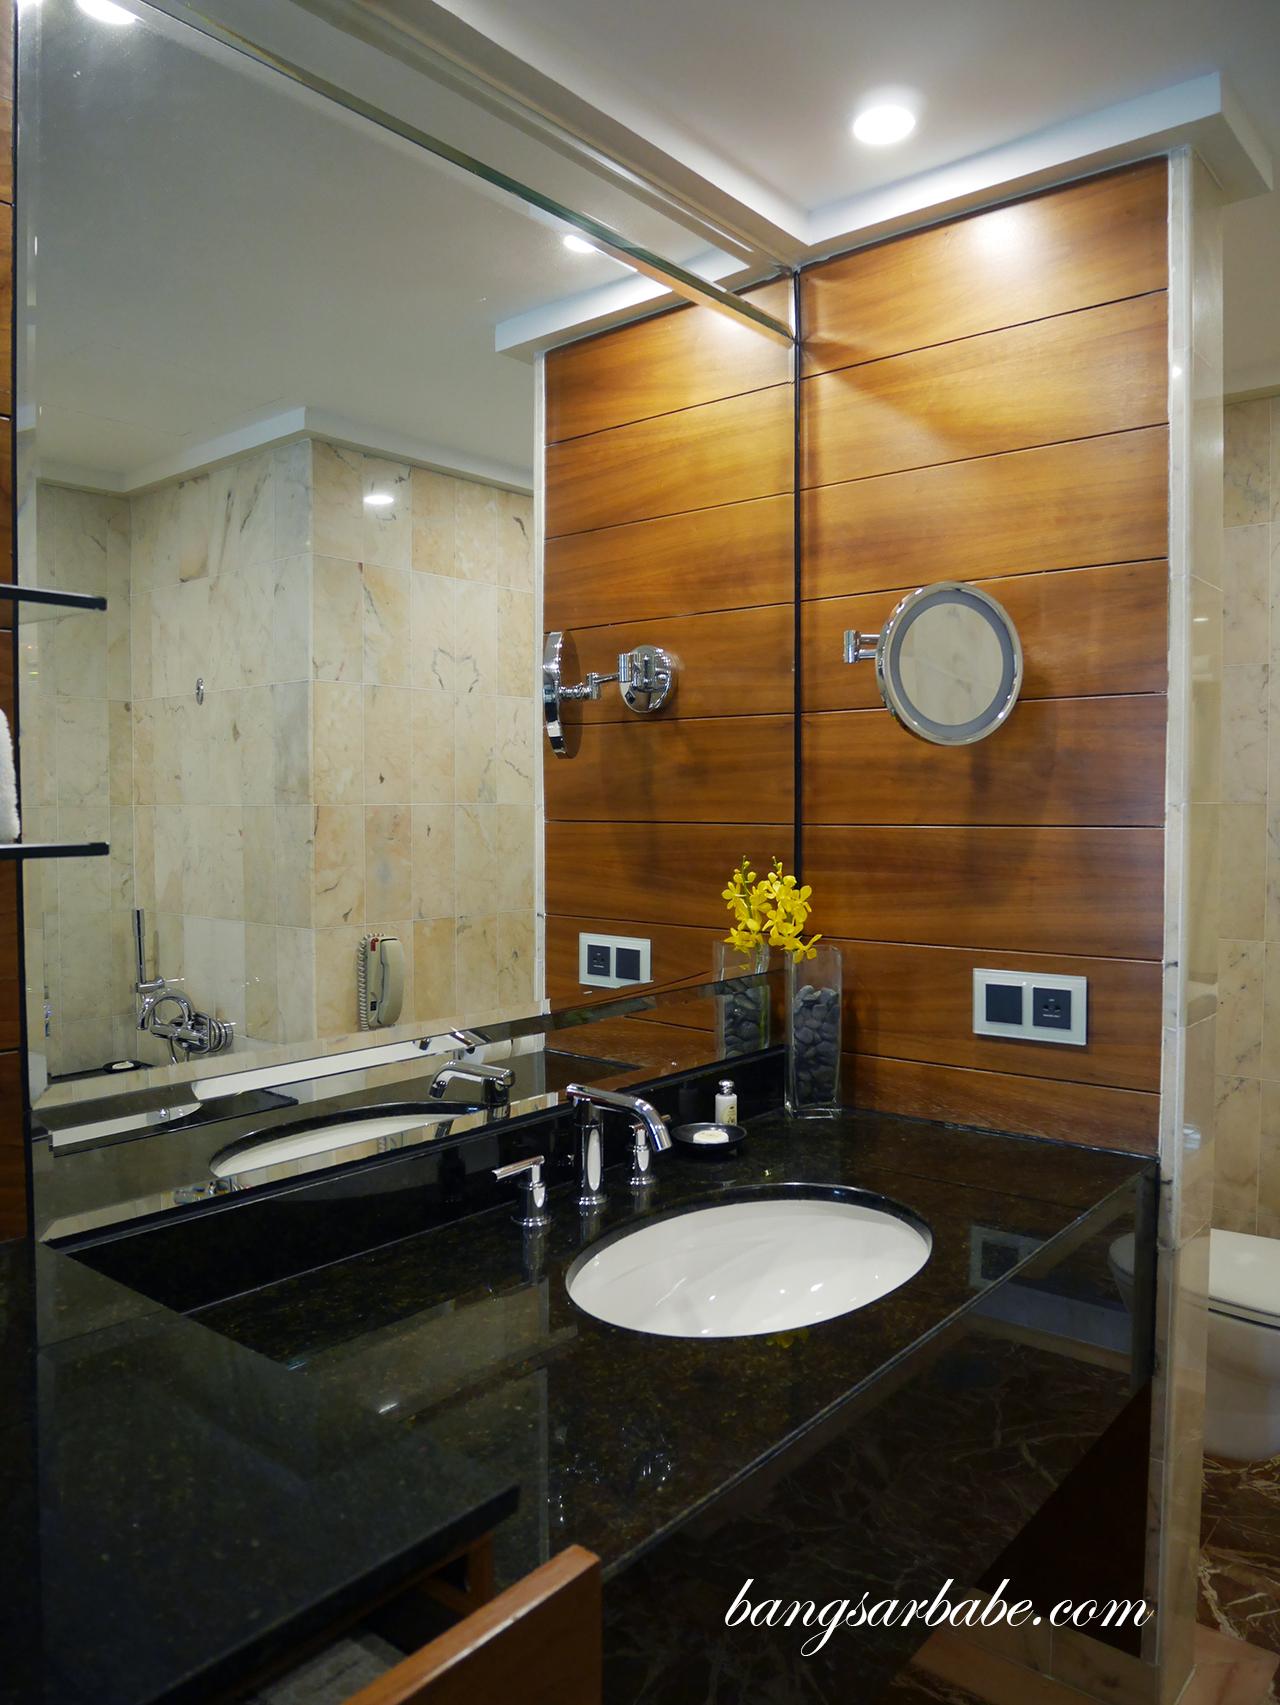 Mandarin oriental singapore bangsar babe - Bathroom cabinets singapore ...